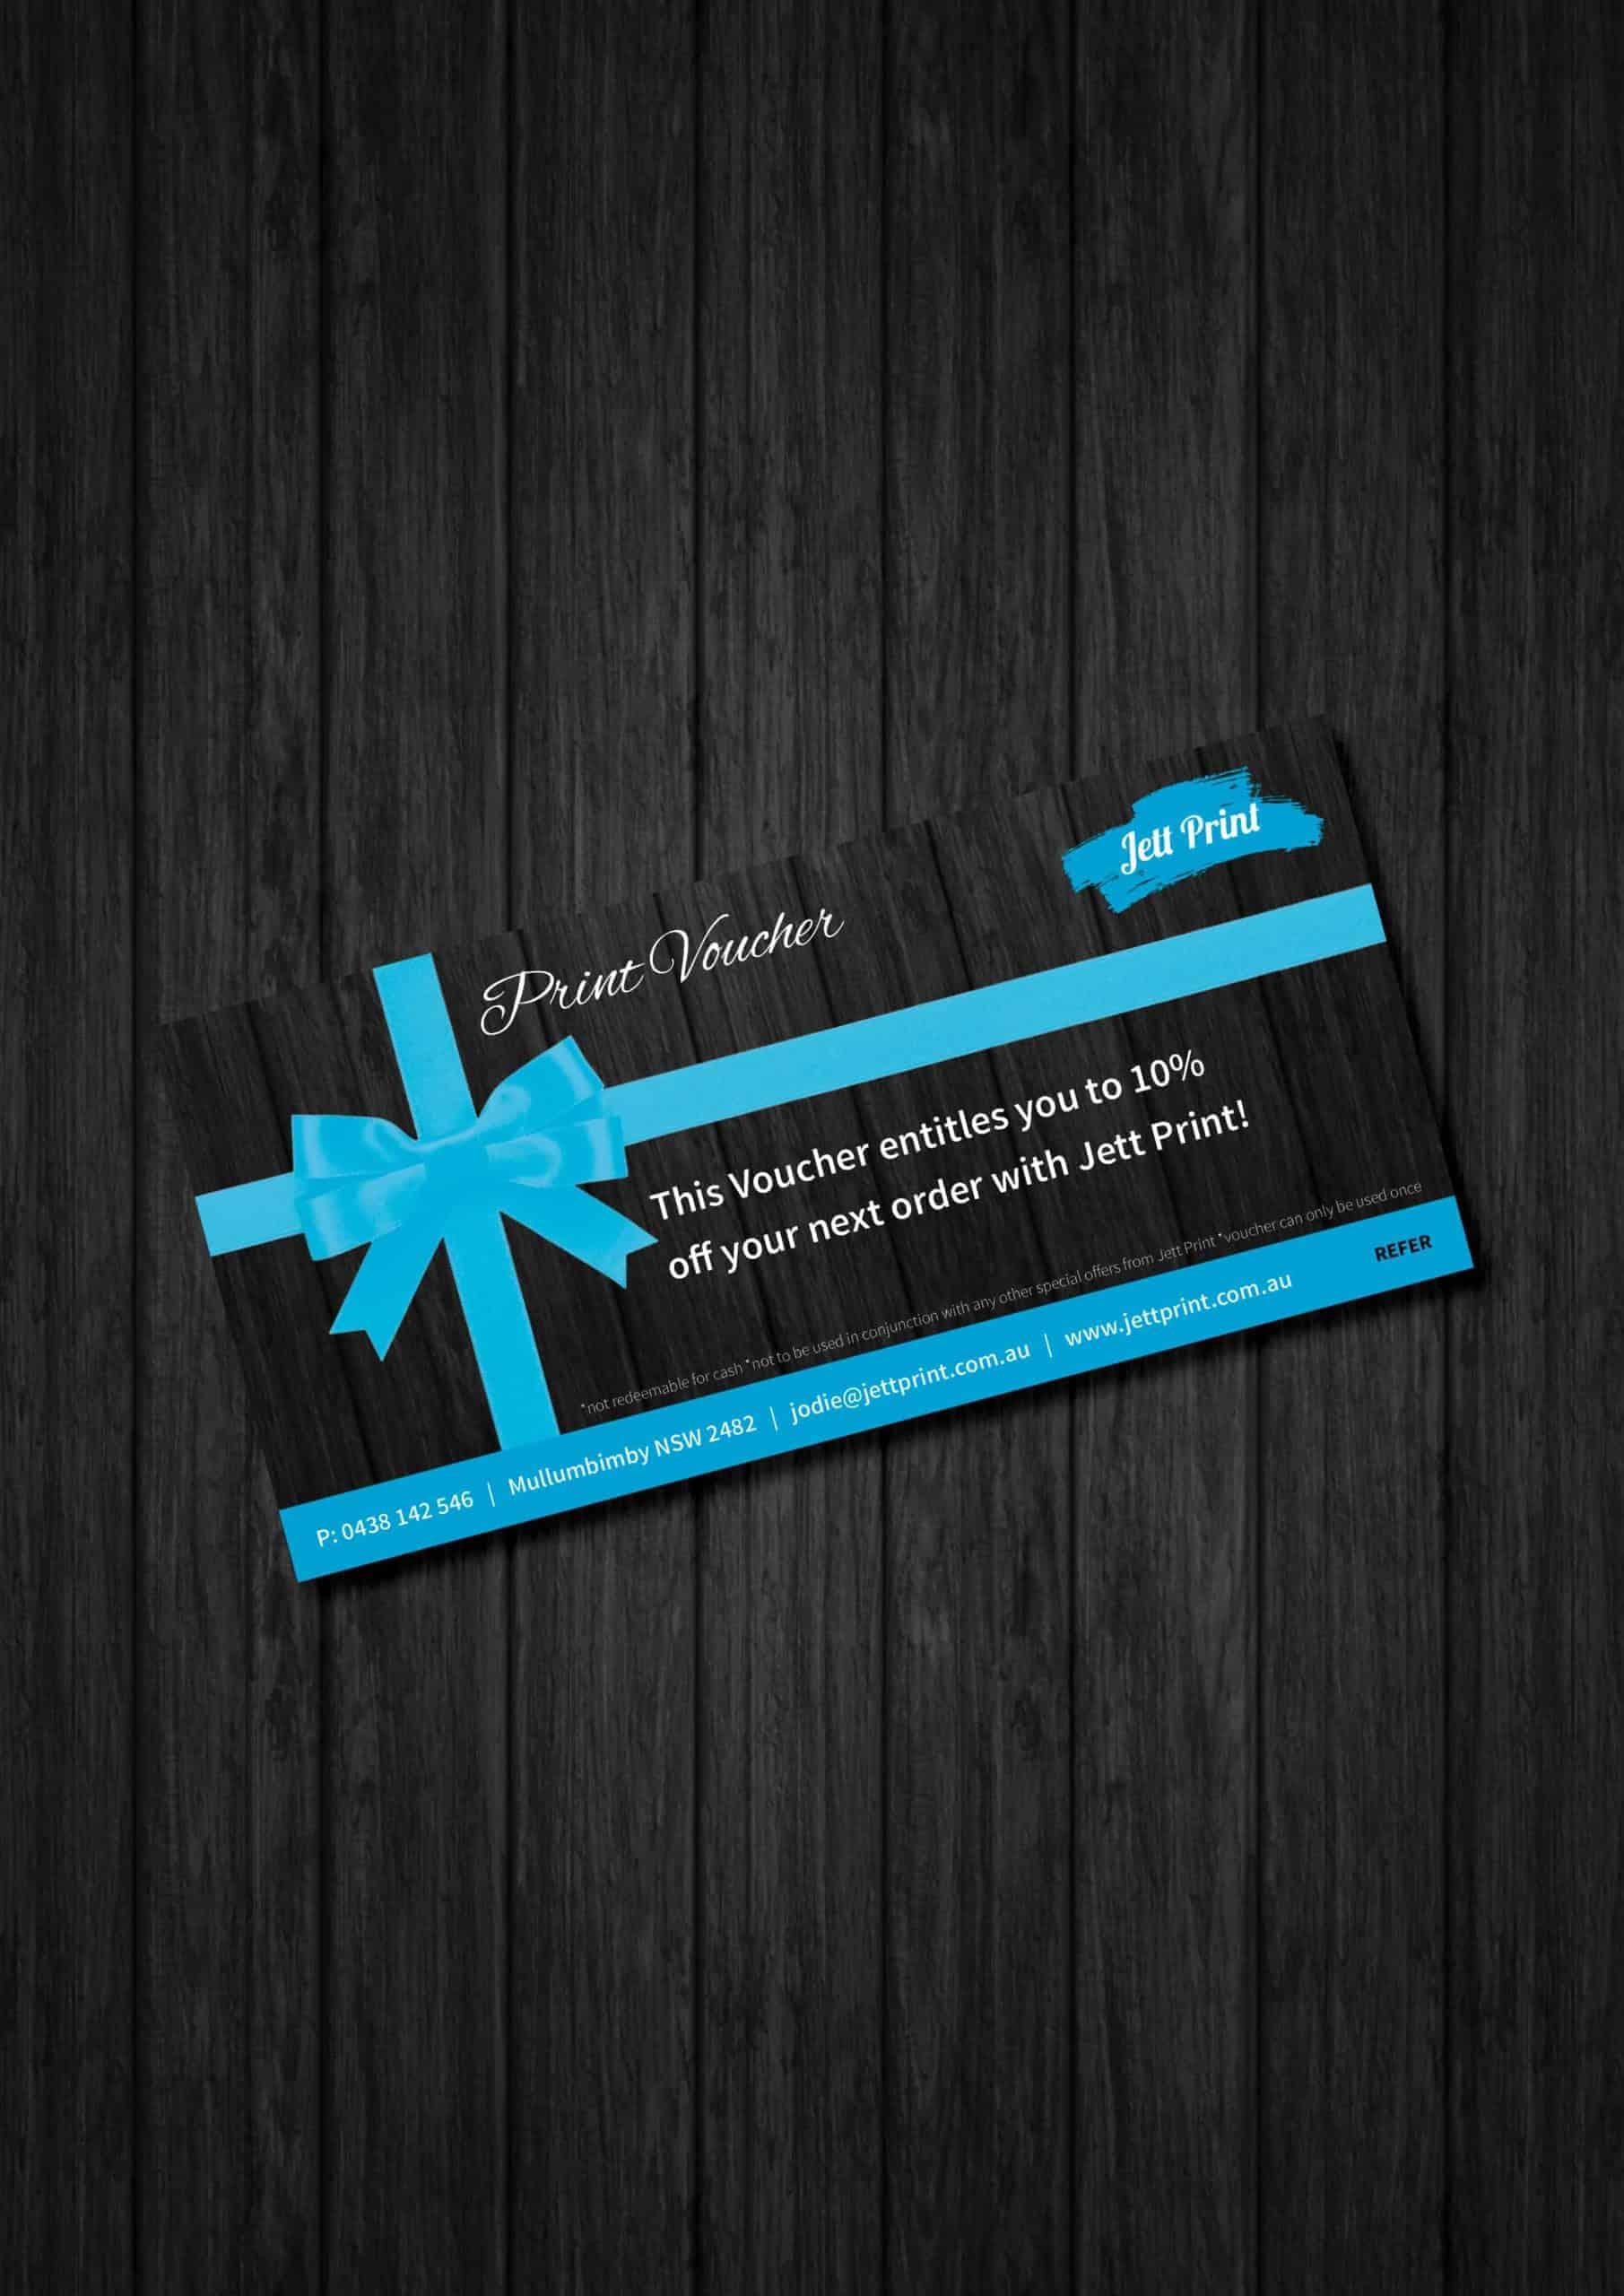 gift-vouchers-printing-gold-coast-tweed-heads-brisbane-byron-bay